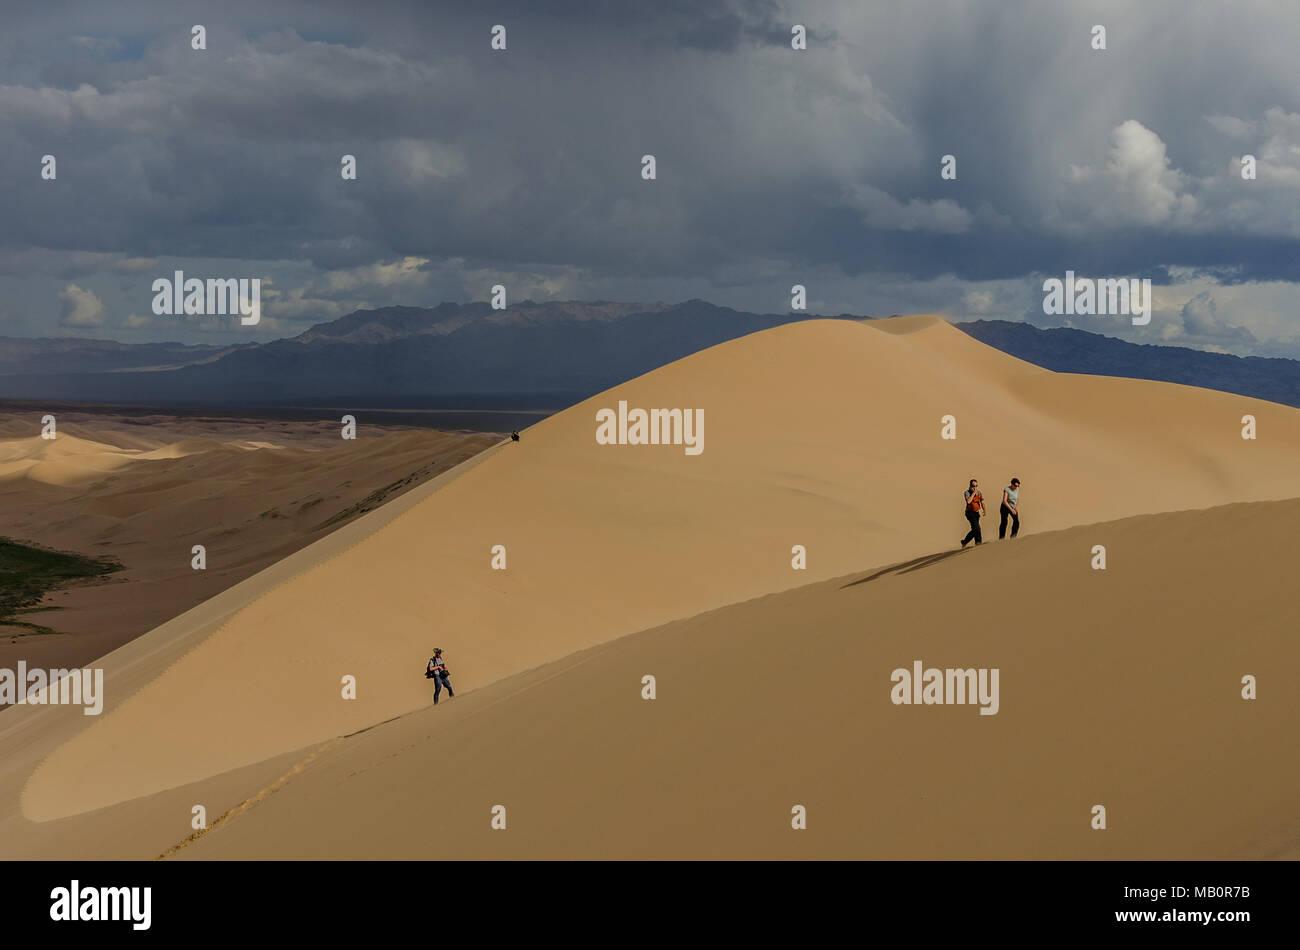 Besteigung des Khongoryn Els, Wüste Gobi, Mongolei Stockfoto